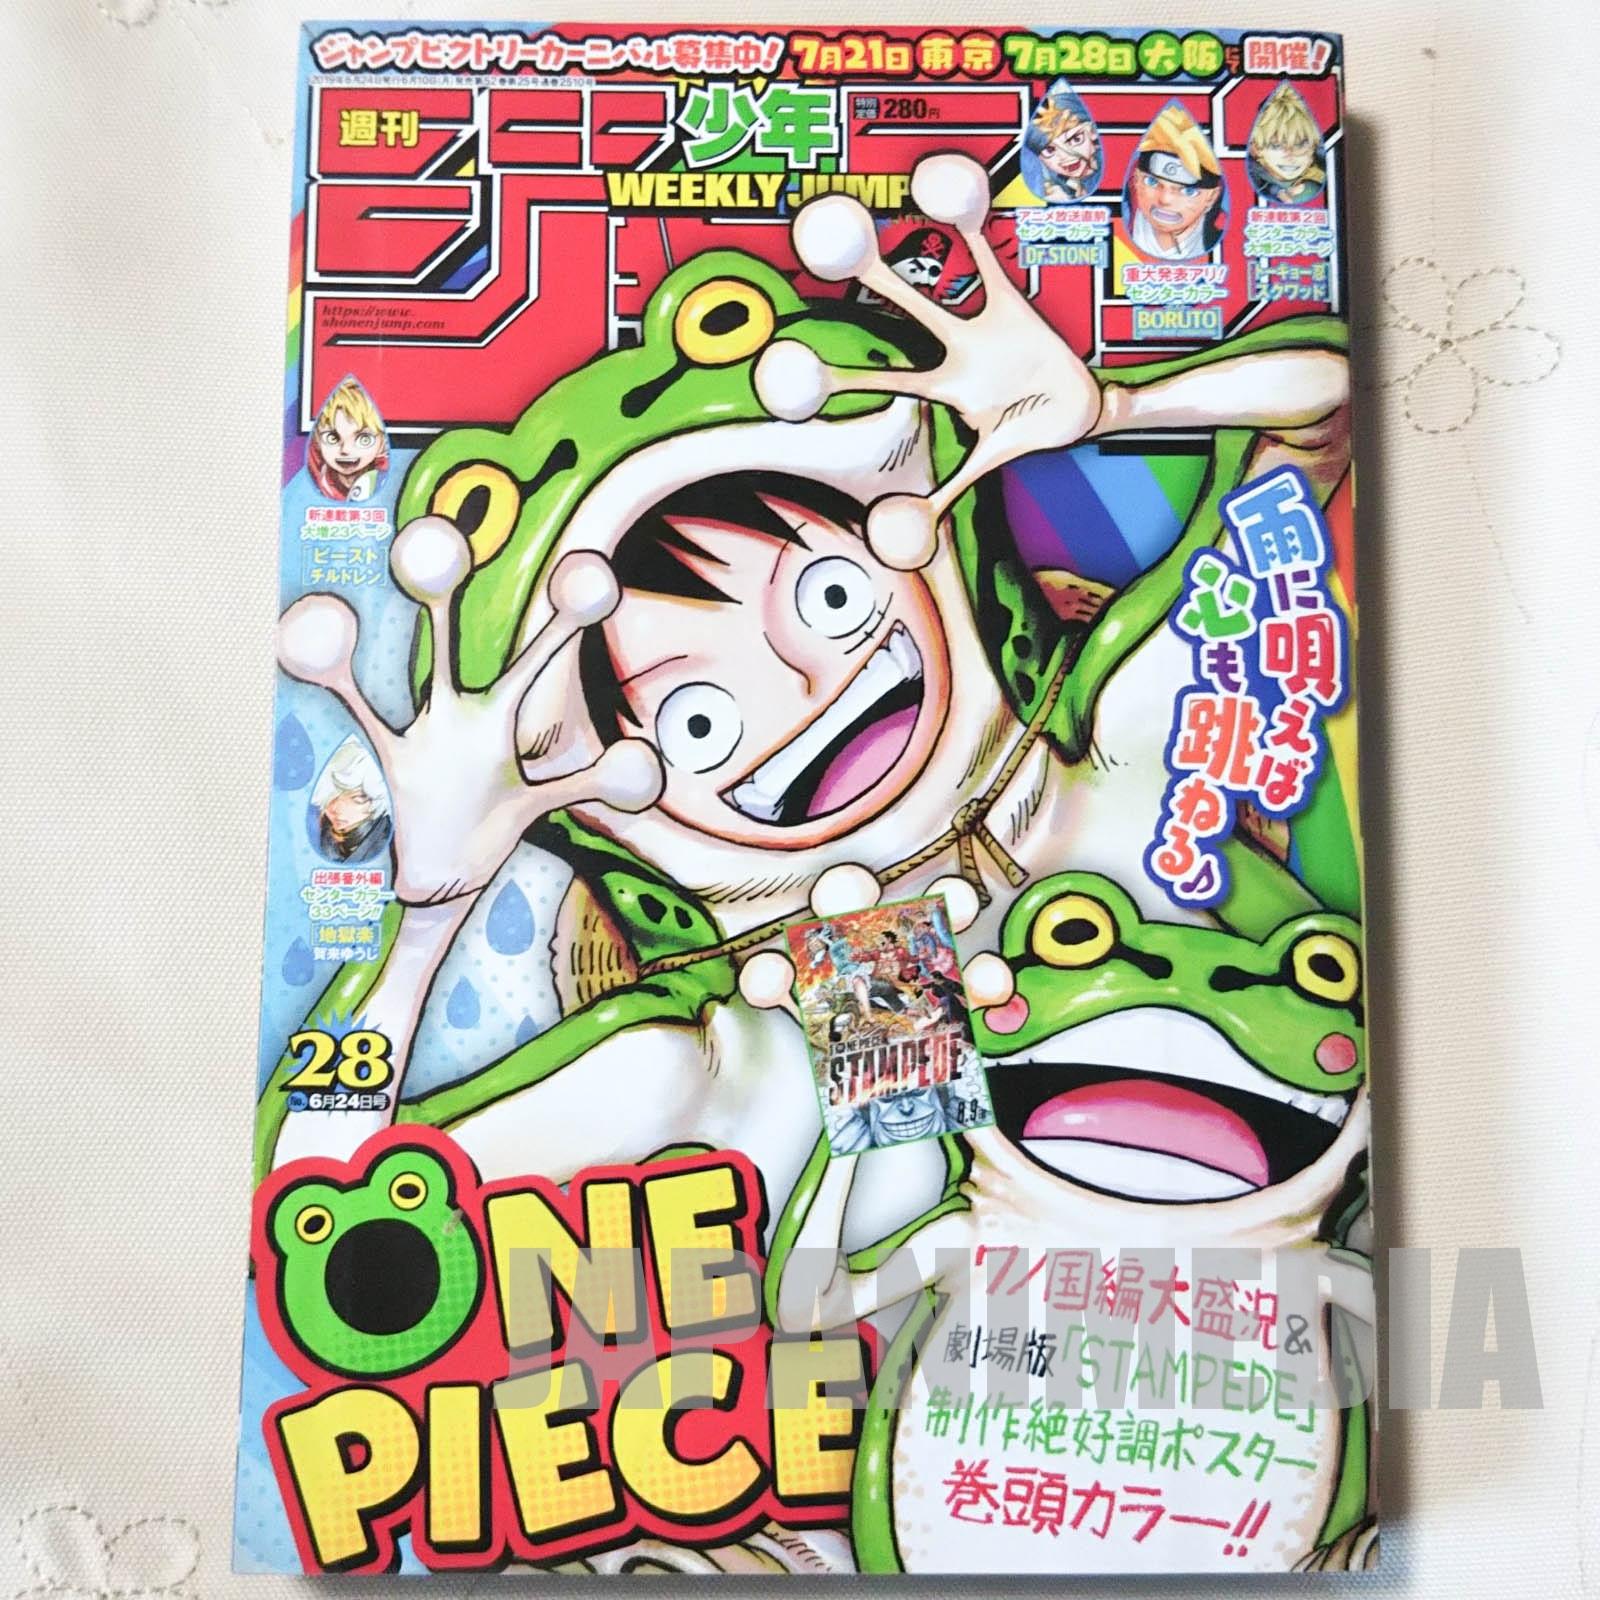 Weekly Shonen JUMP Vol.28 2019 One Piece / Japanese Magazine JAPAN MANGA